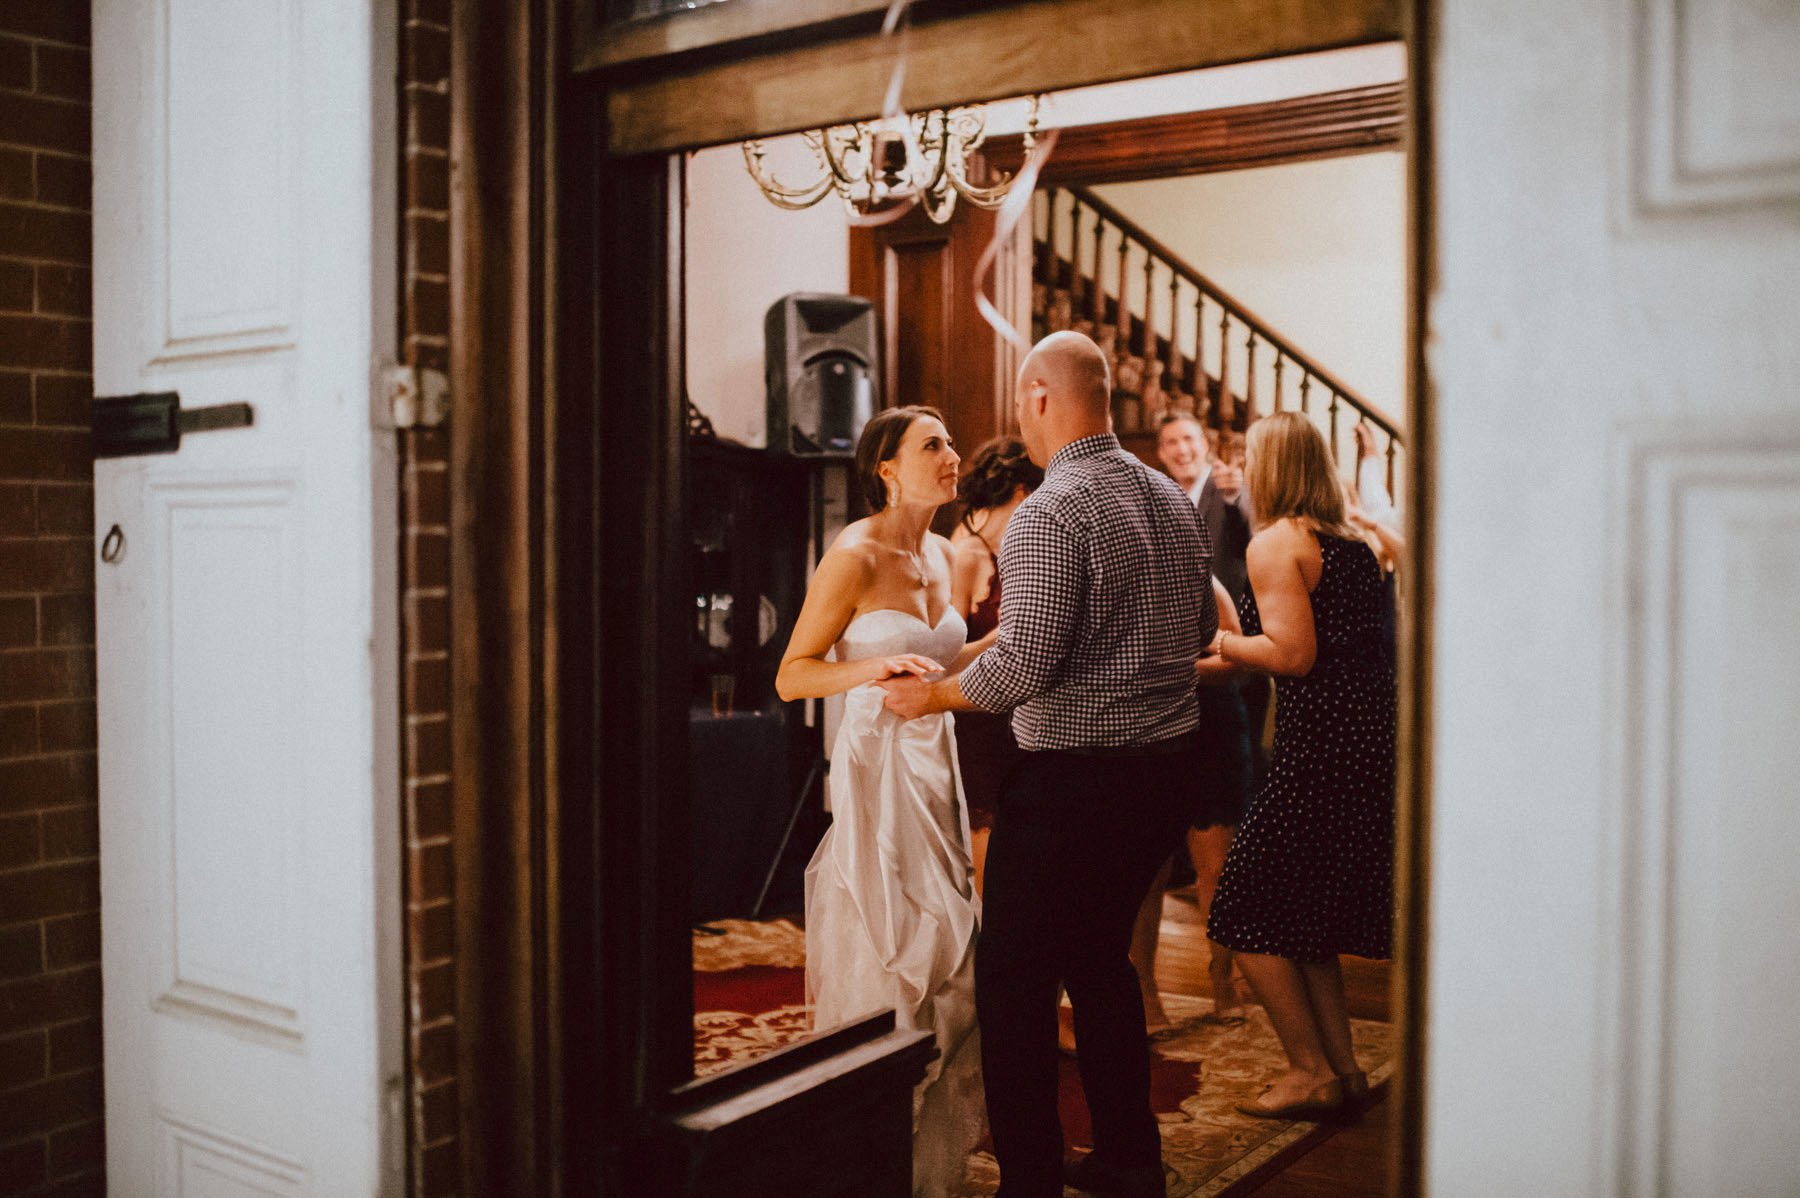 faunbrook-bed-and-breakfast-wedding-189.jpg